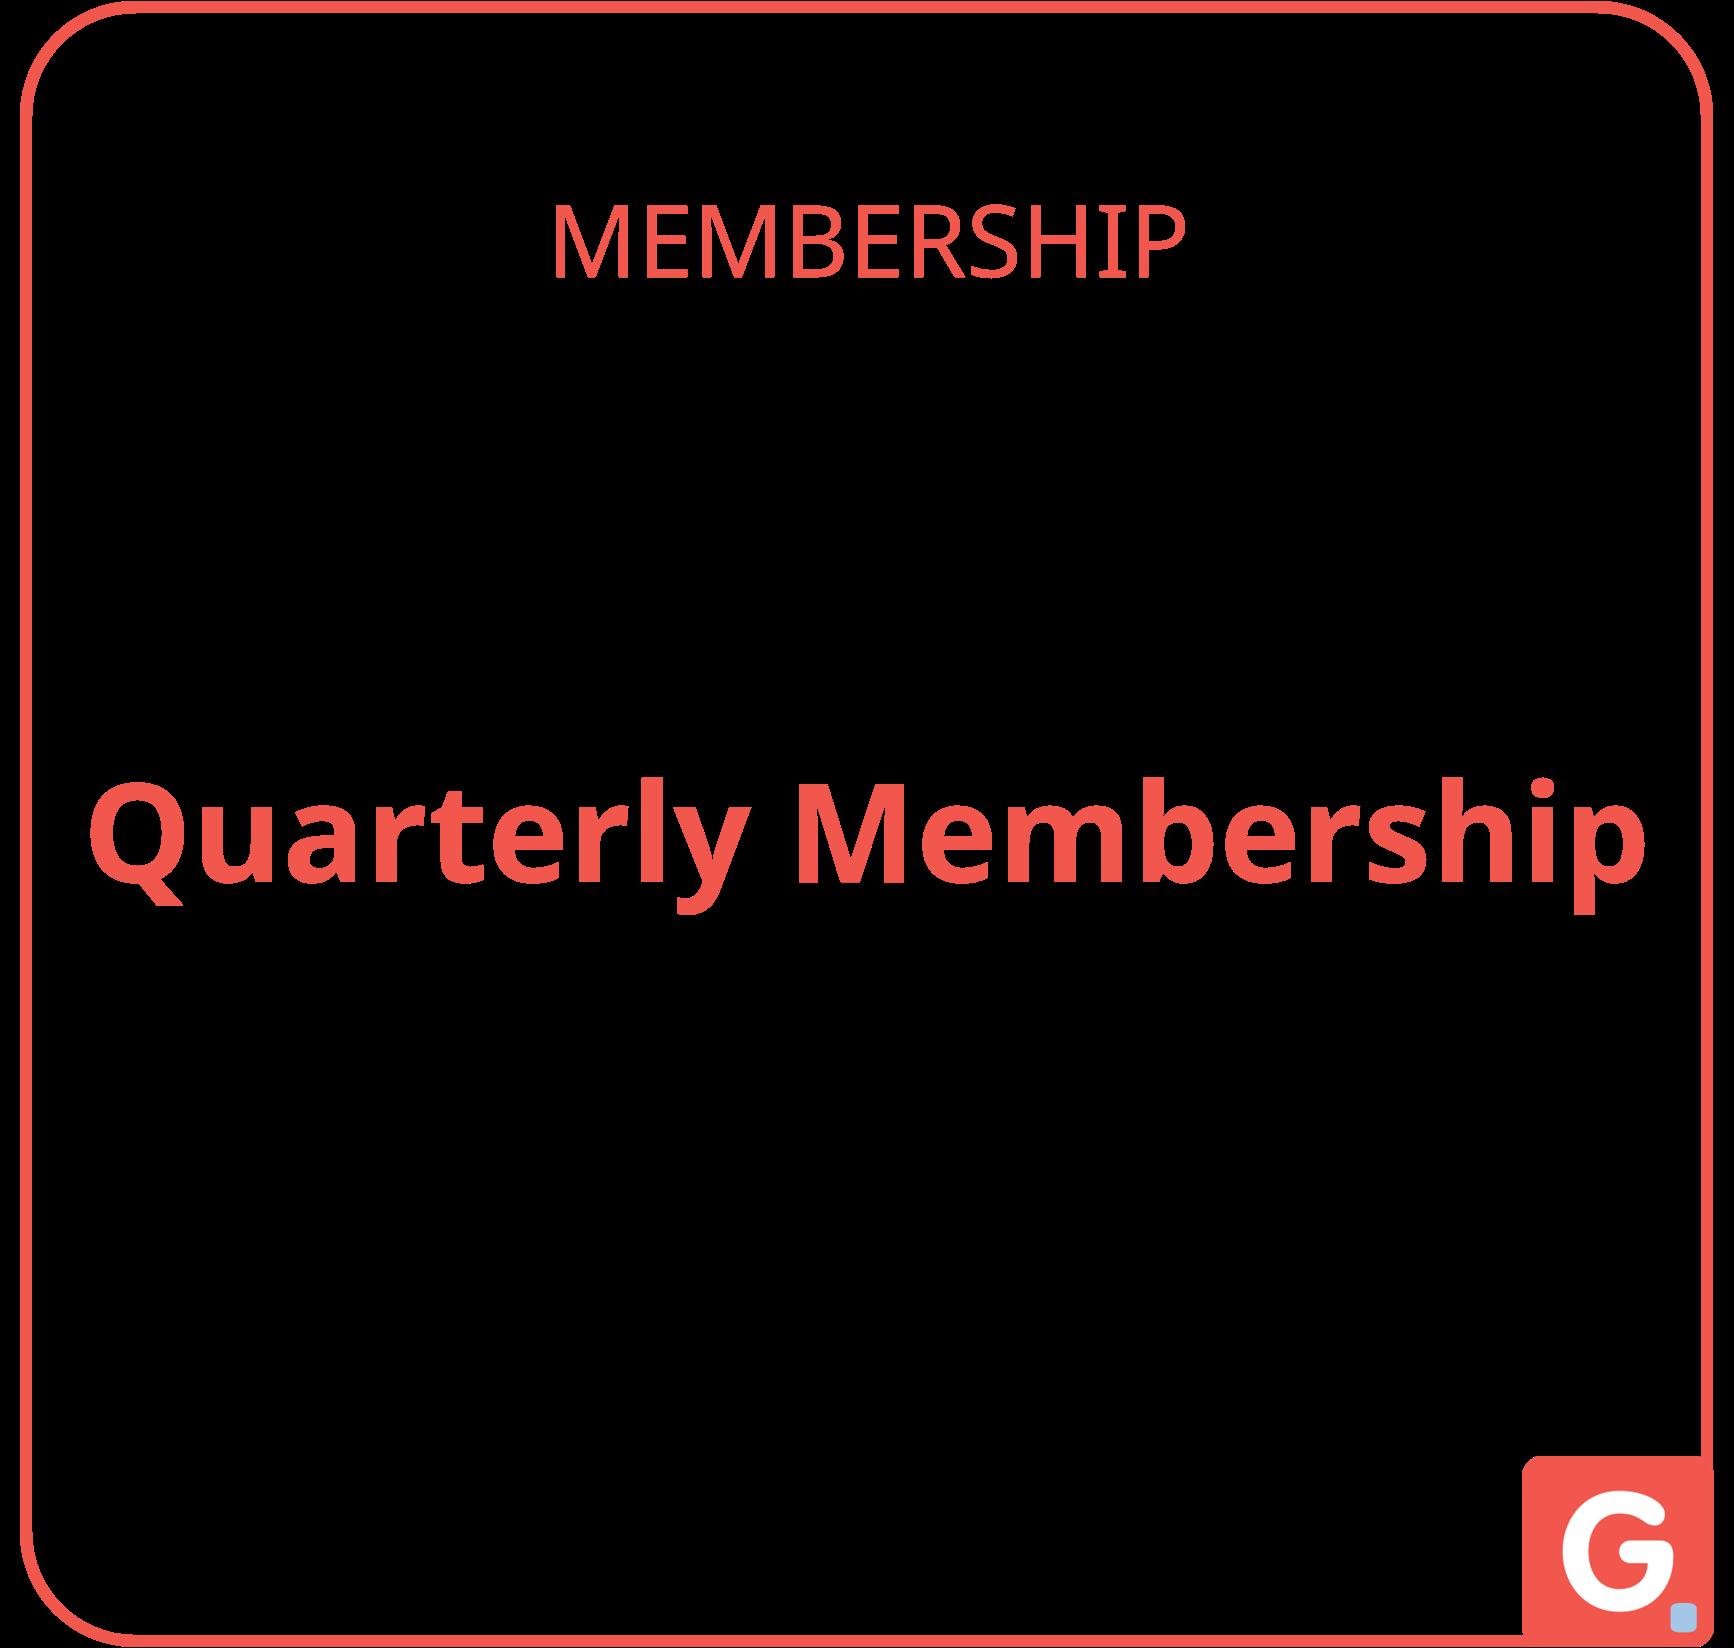 QUARTERLY MEMBERSHIP   Gpl.ONE